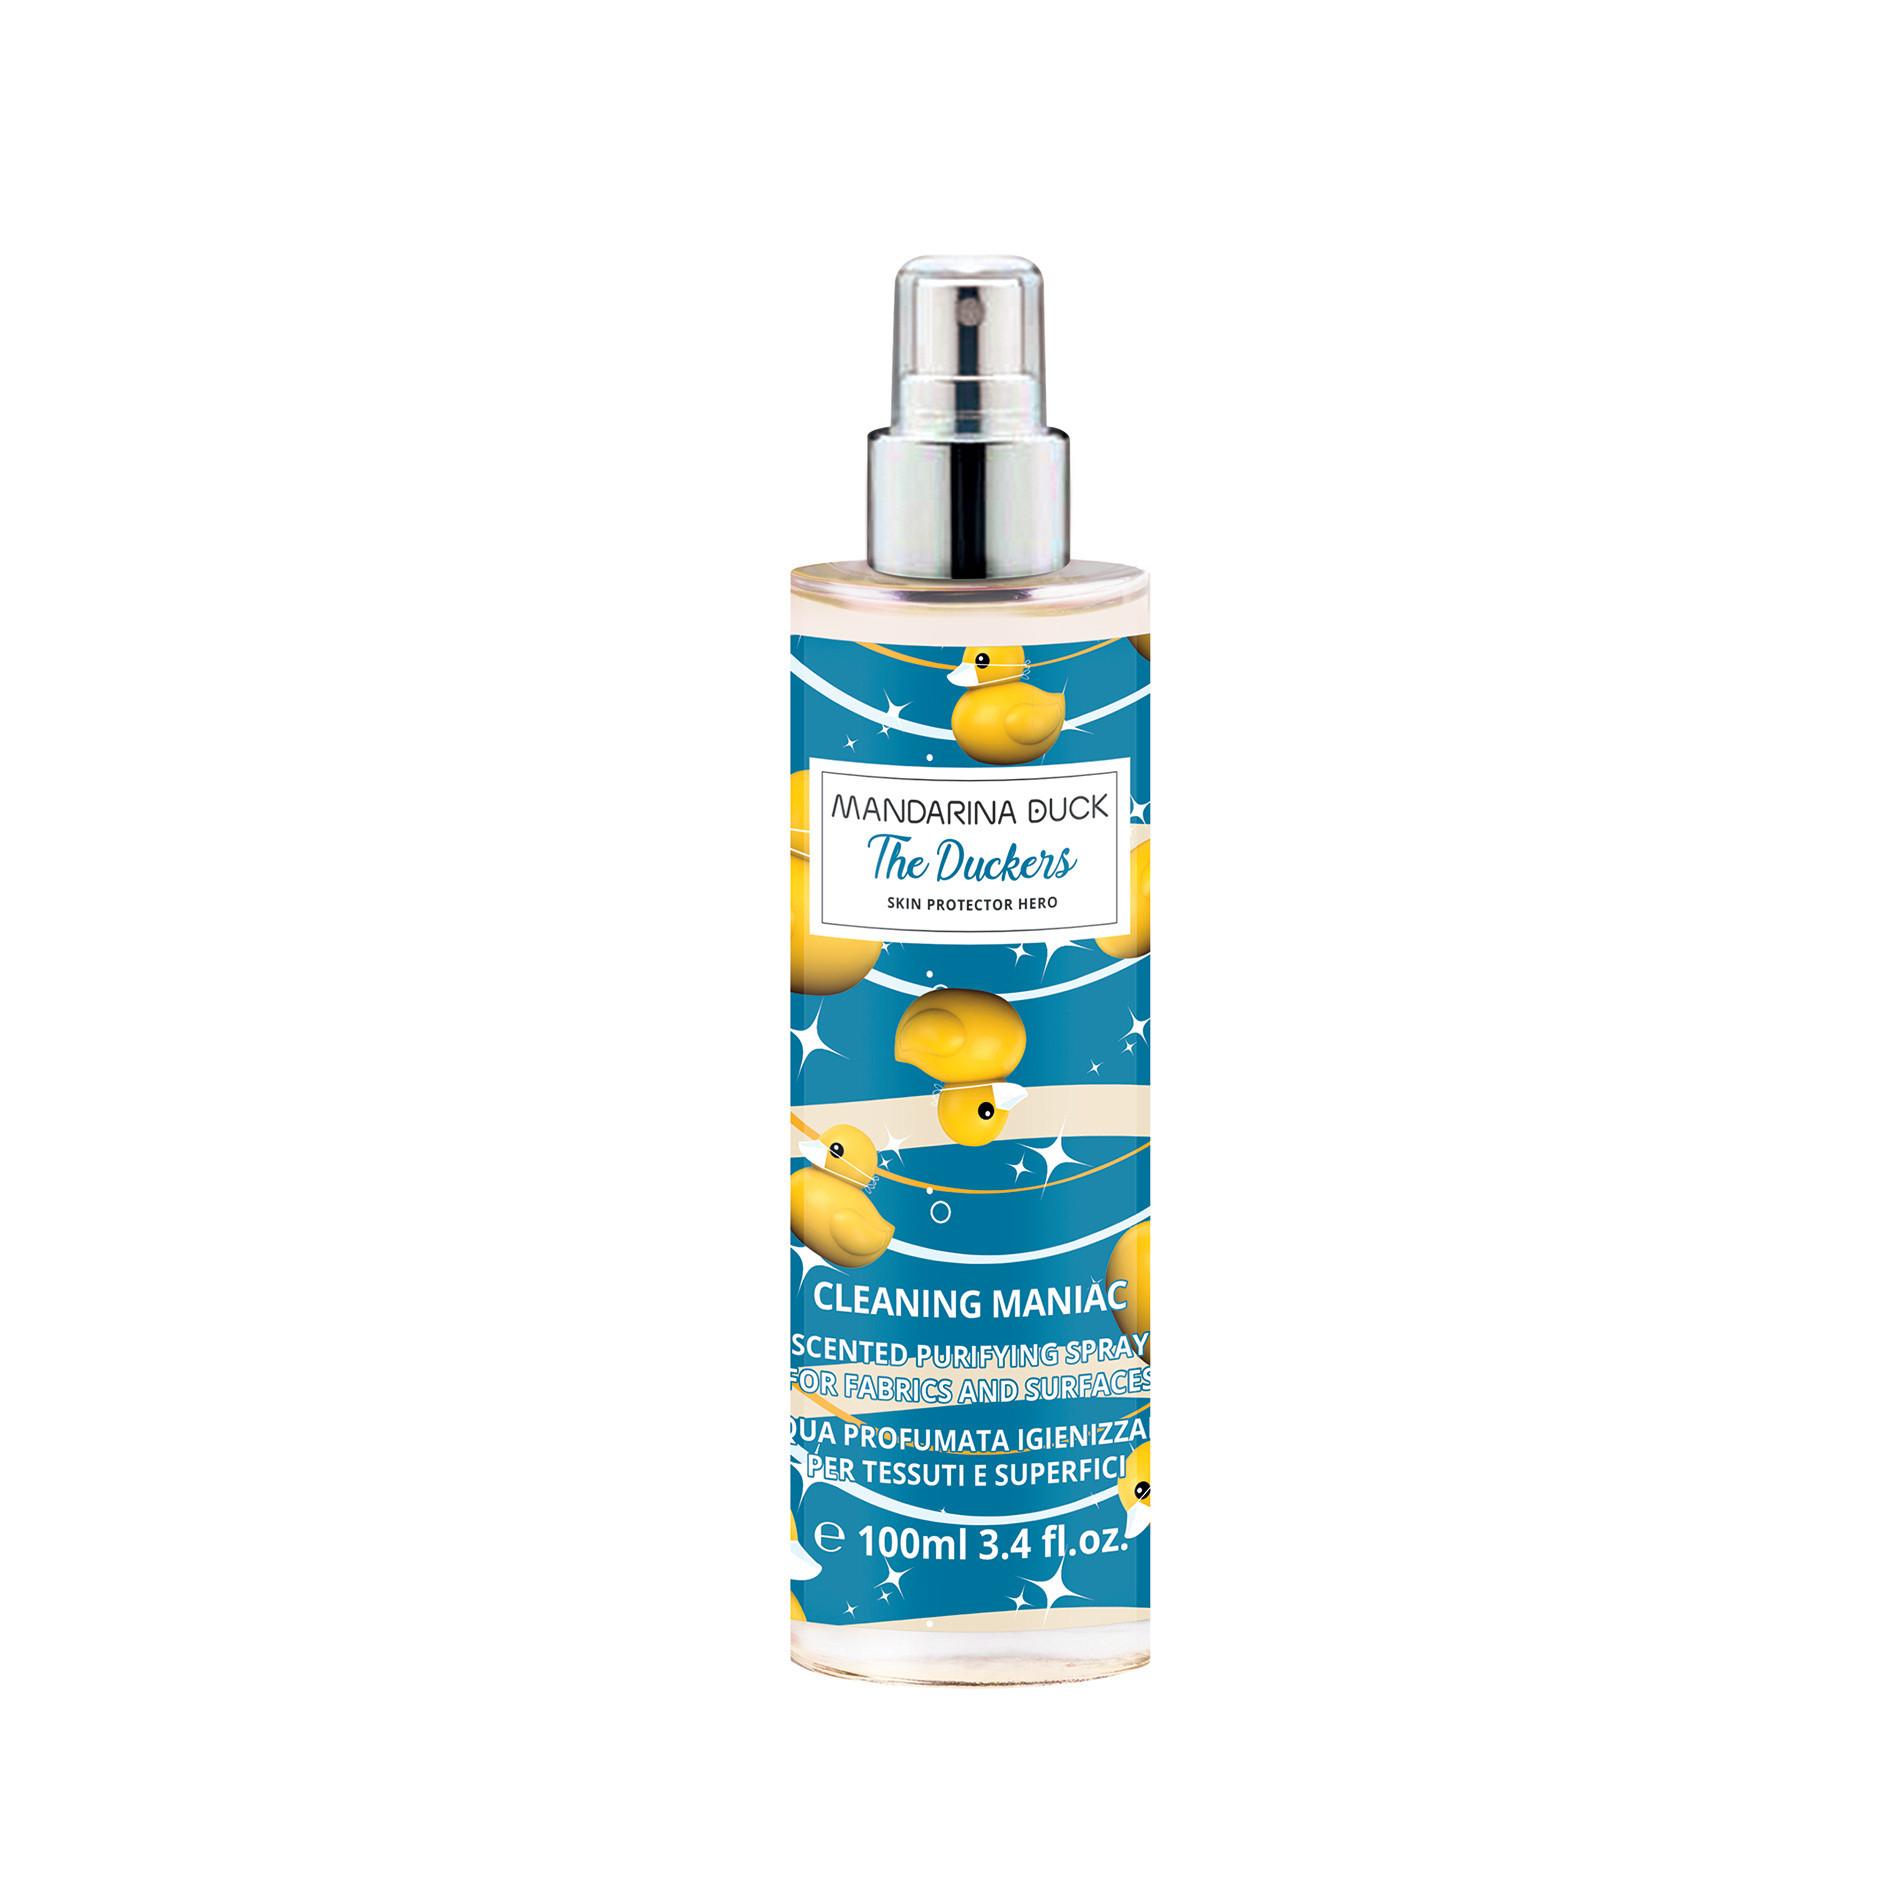 Spray sanificante tessuti e superfici Mandarina Duck 100ml, Multicolor, large image number 0